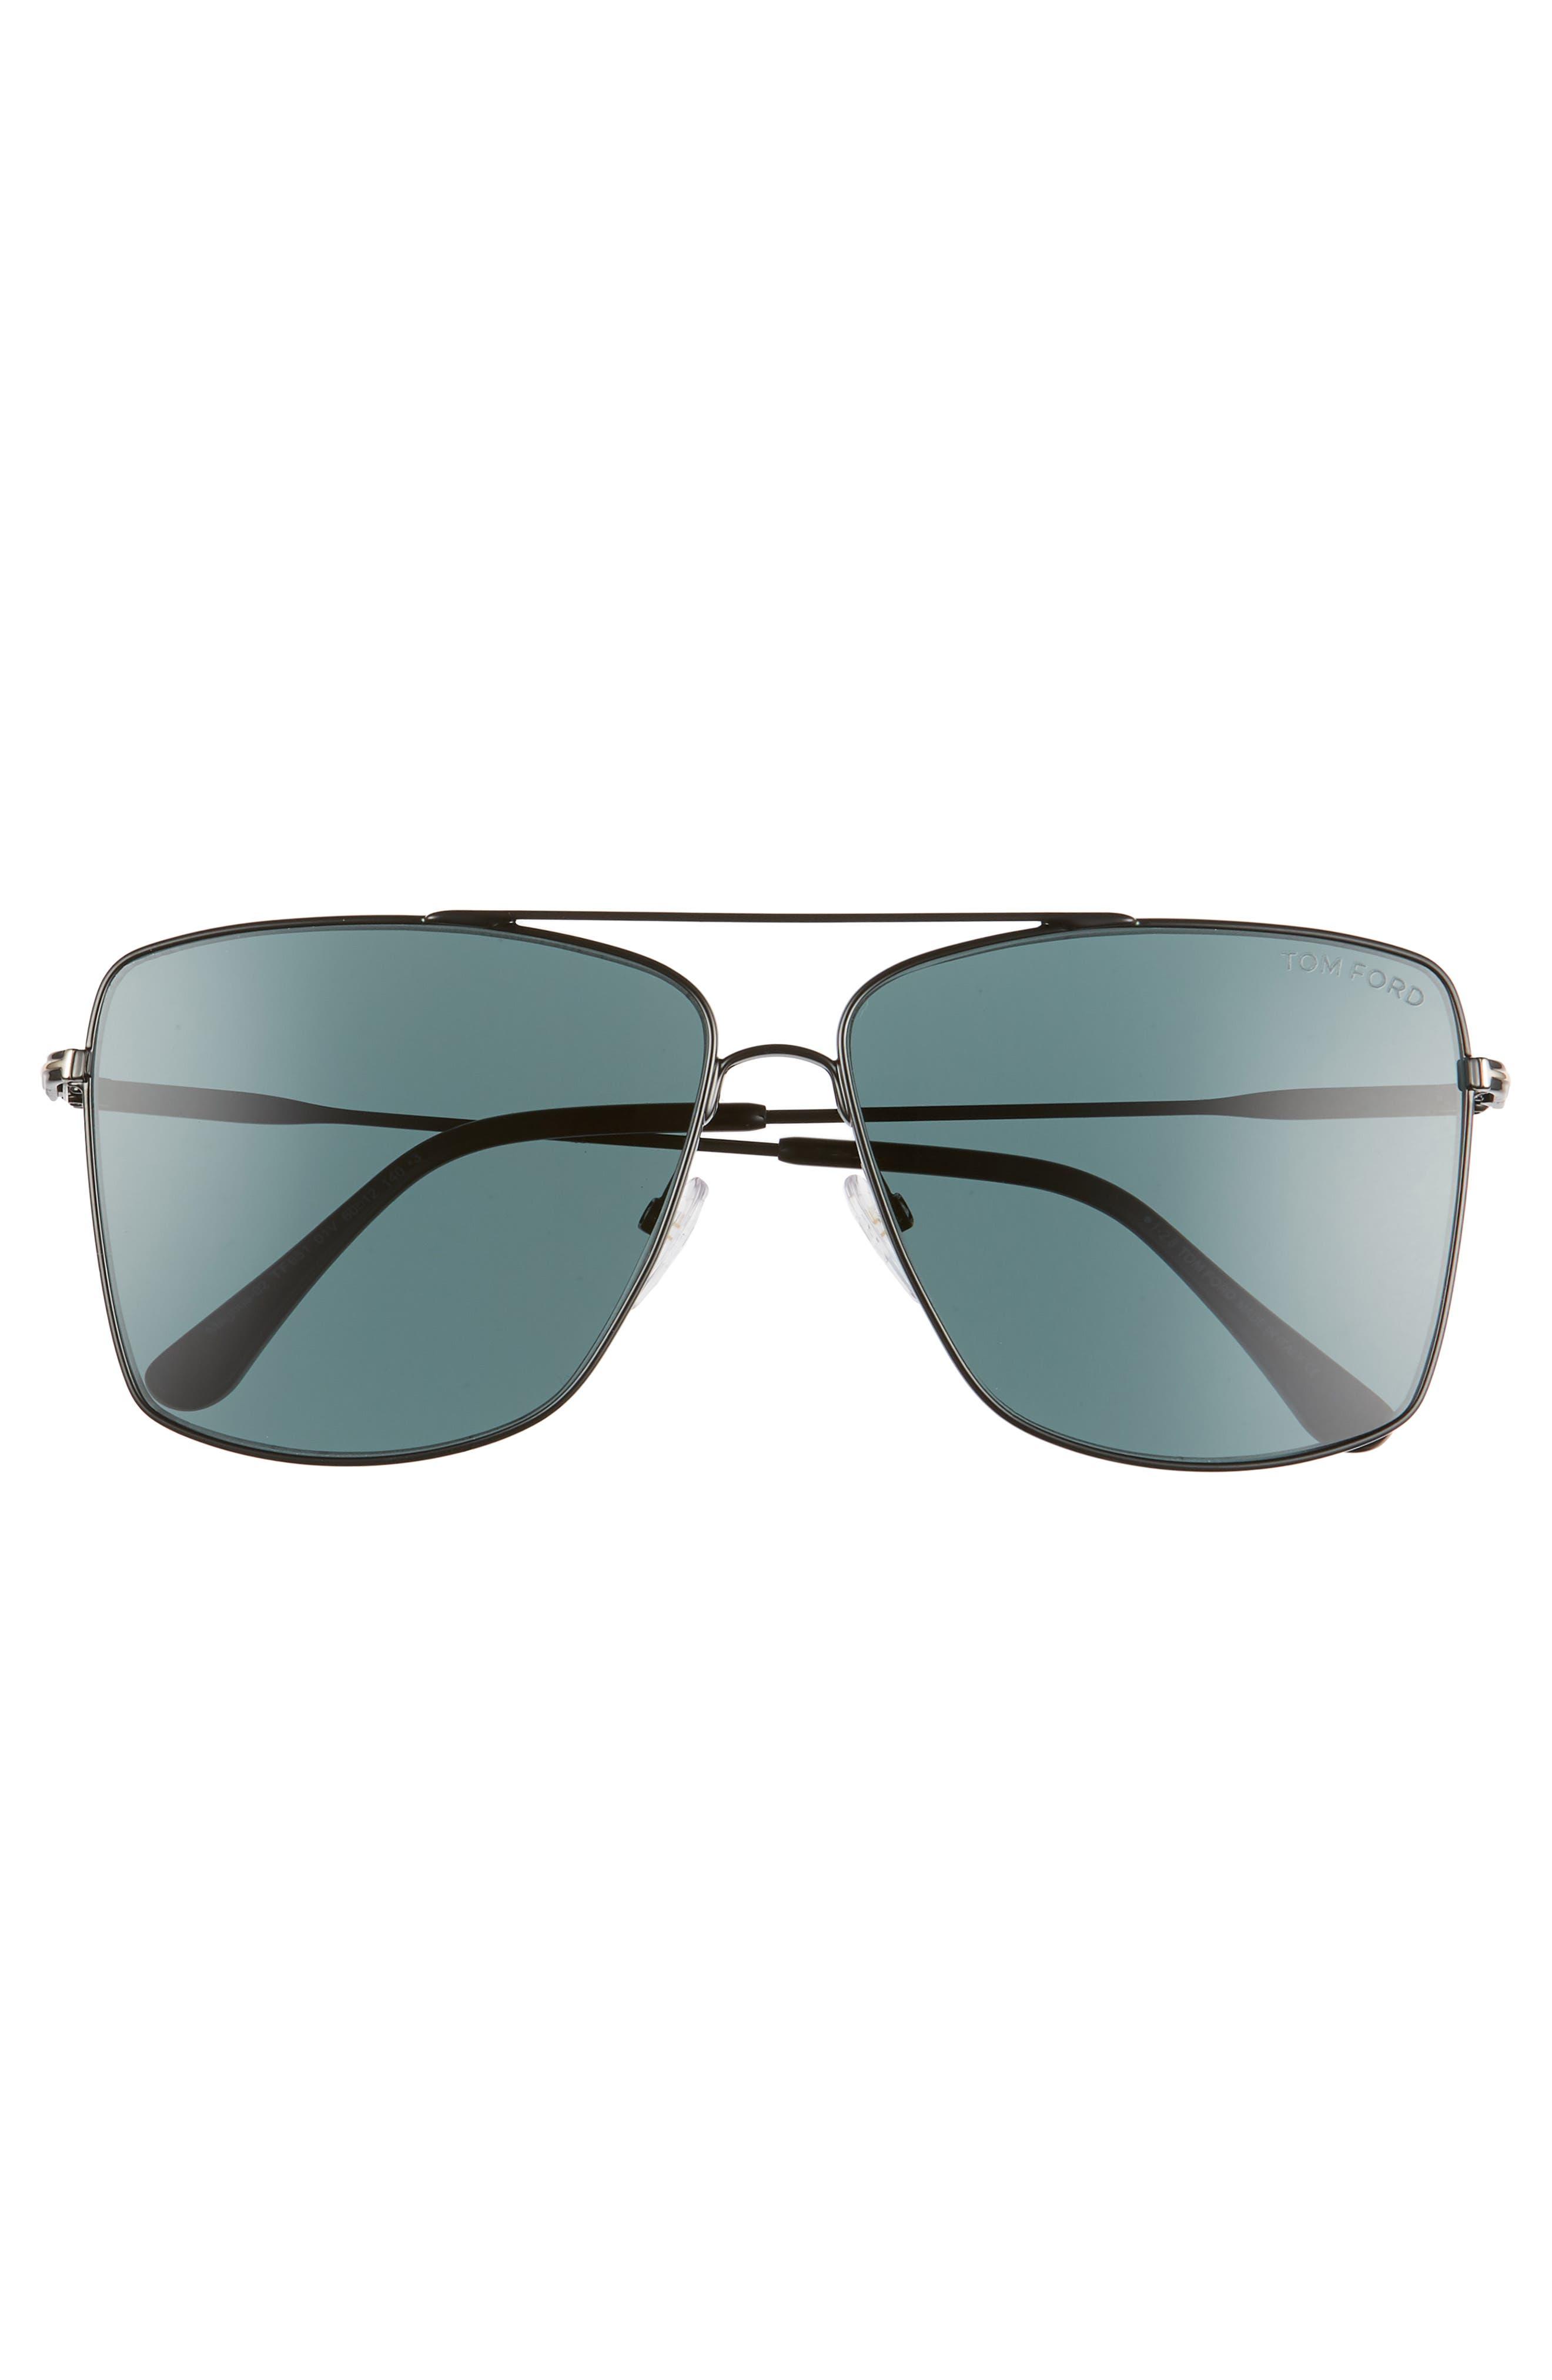 Magnus 60mm Aviator Sunglasses,                             Alternate thumbnail 3, color,                             SHINY BLACK/ DARK TEAL